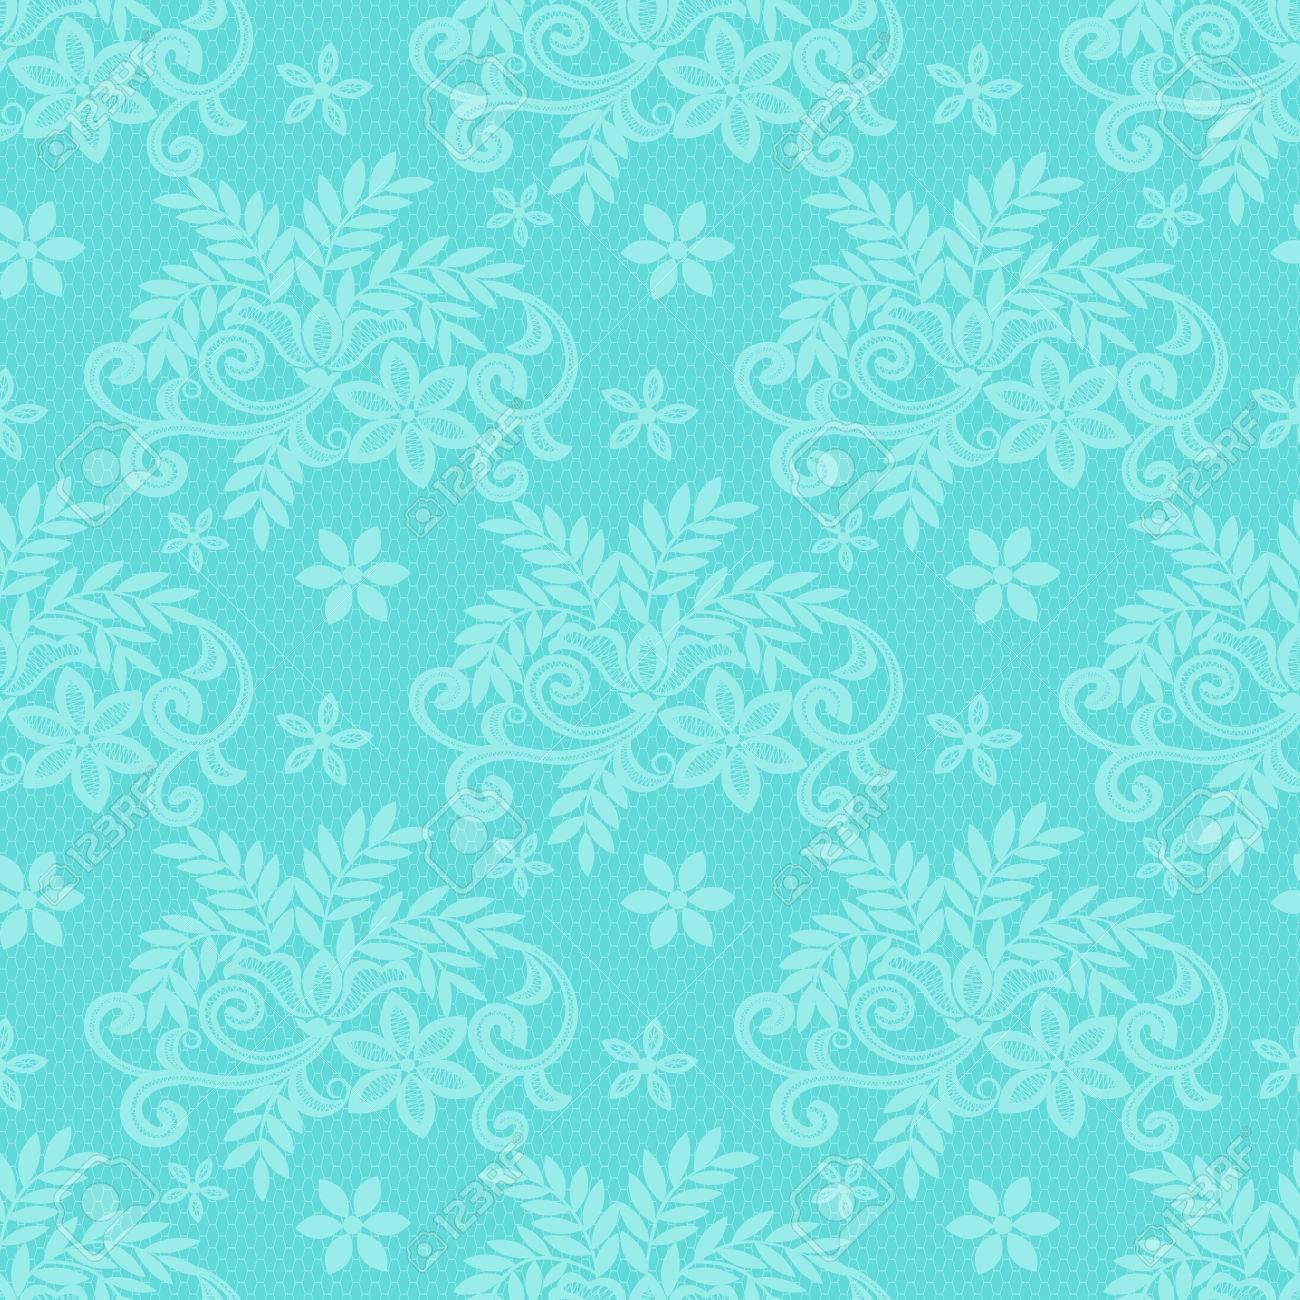 Turquoise Background Pattern Kampa Luckincsolutions Org